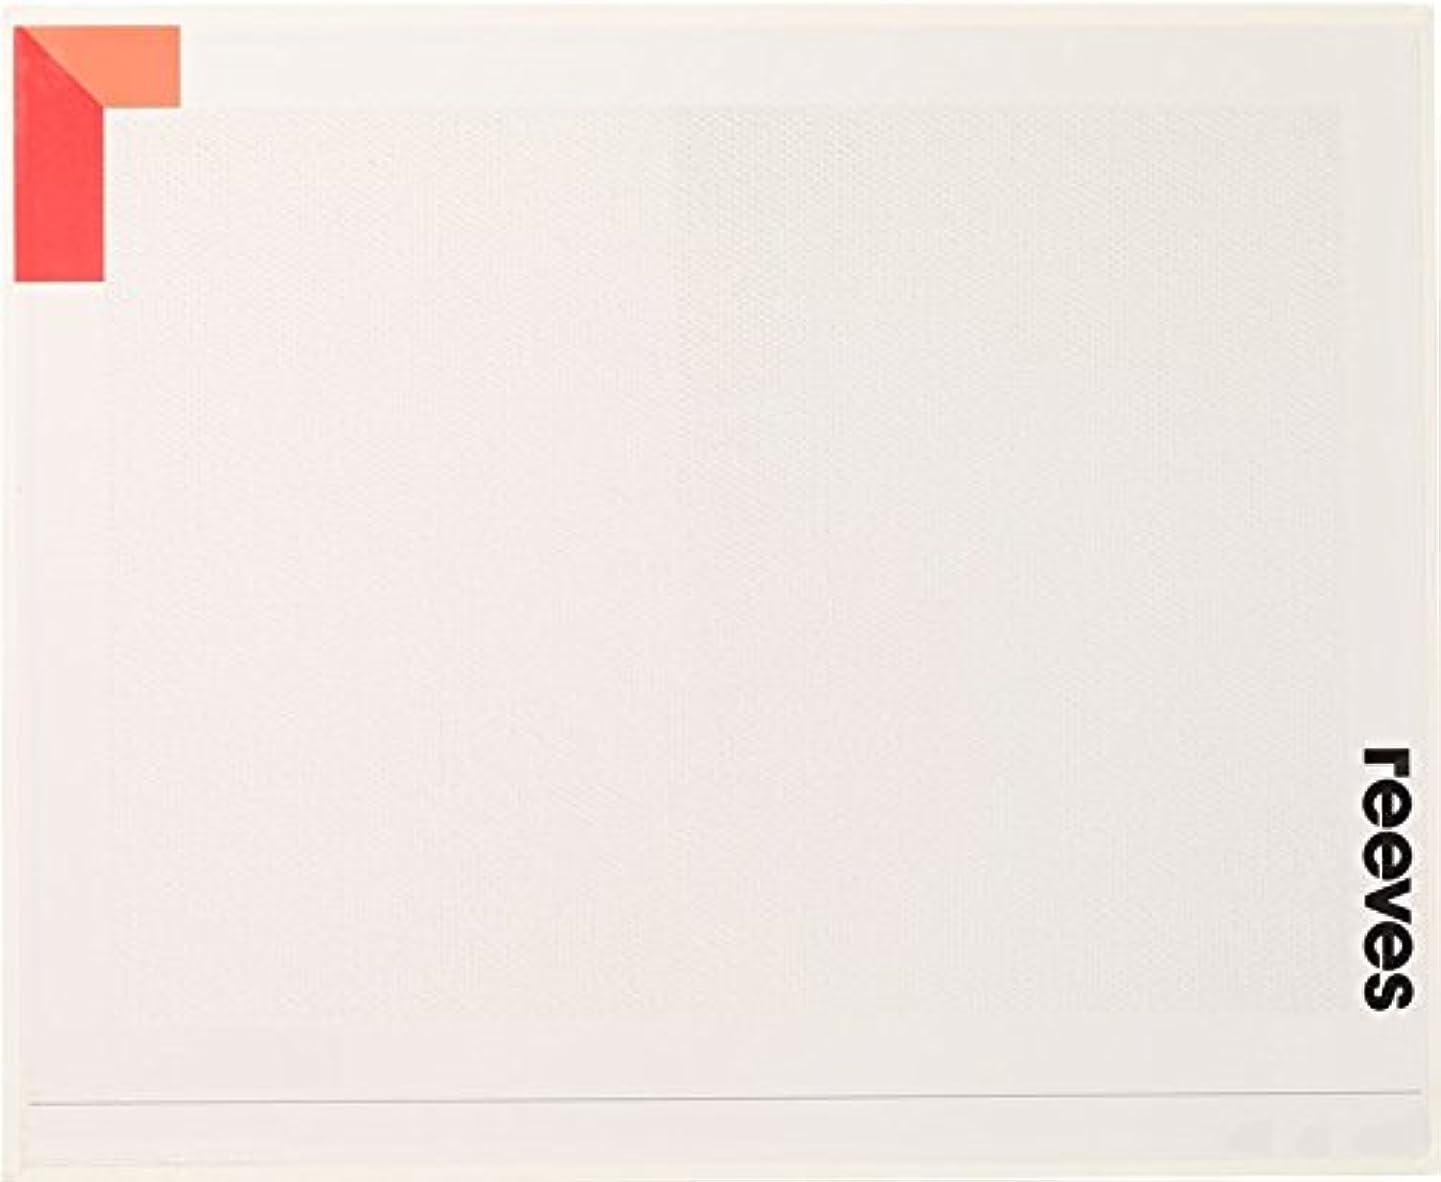 Reeves 8330830?Cotton Stretched Canvas Frame, 100% Cotton, Cotton, Baumwoll-Keilrahmen, 40 x 60 cm